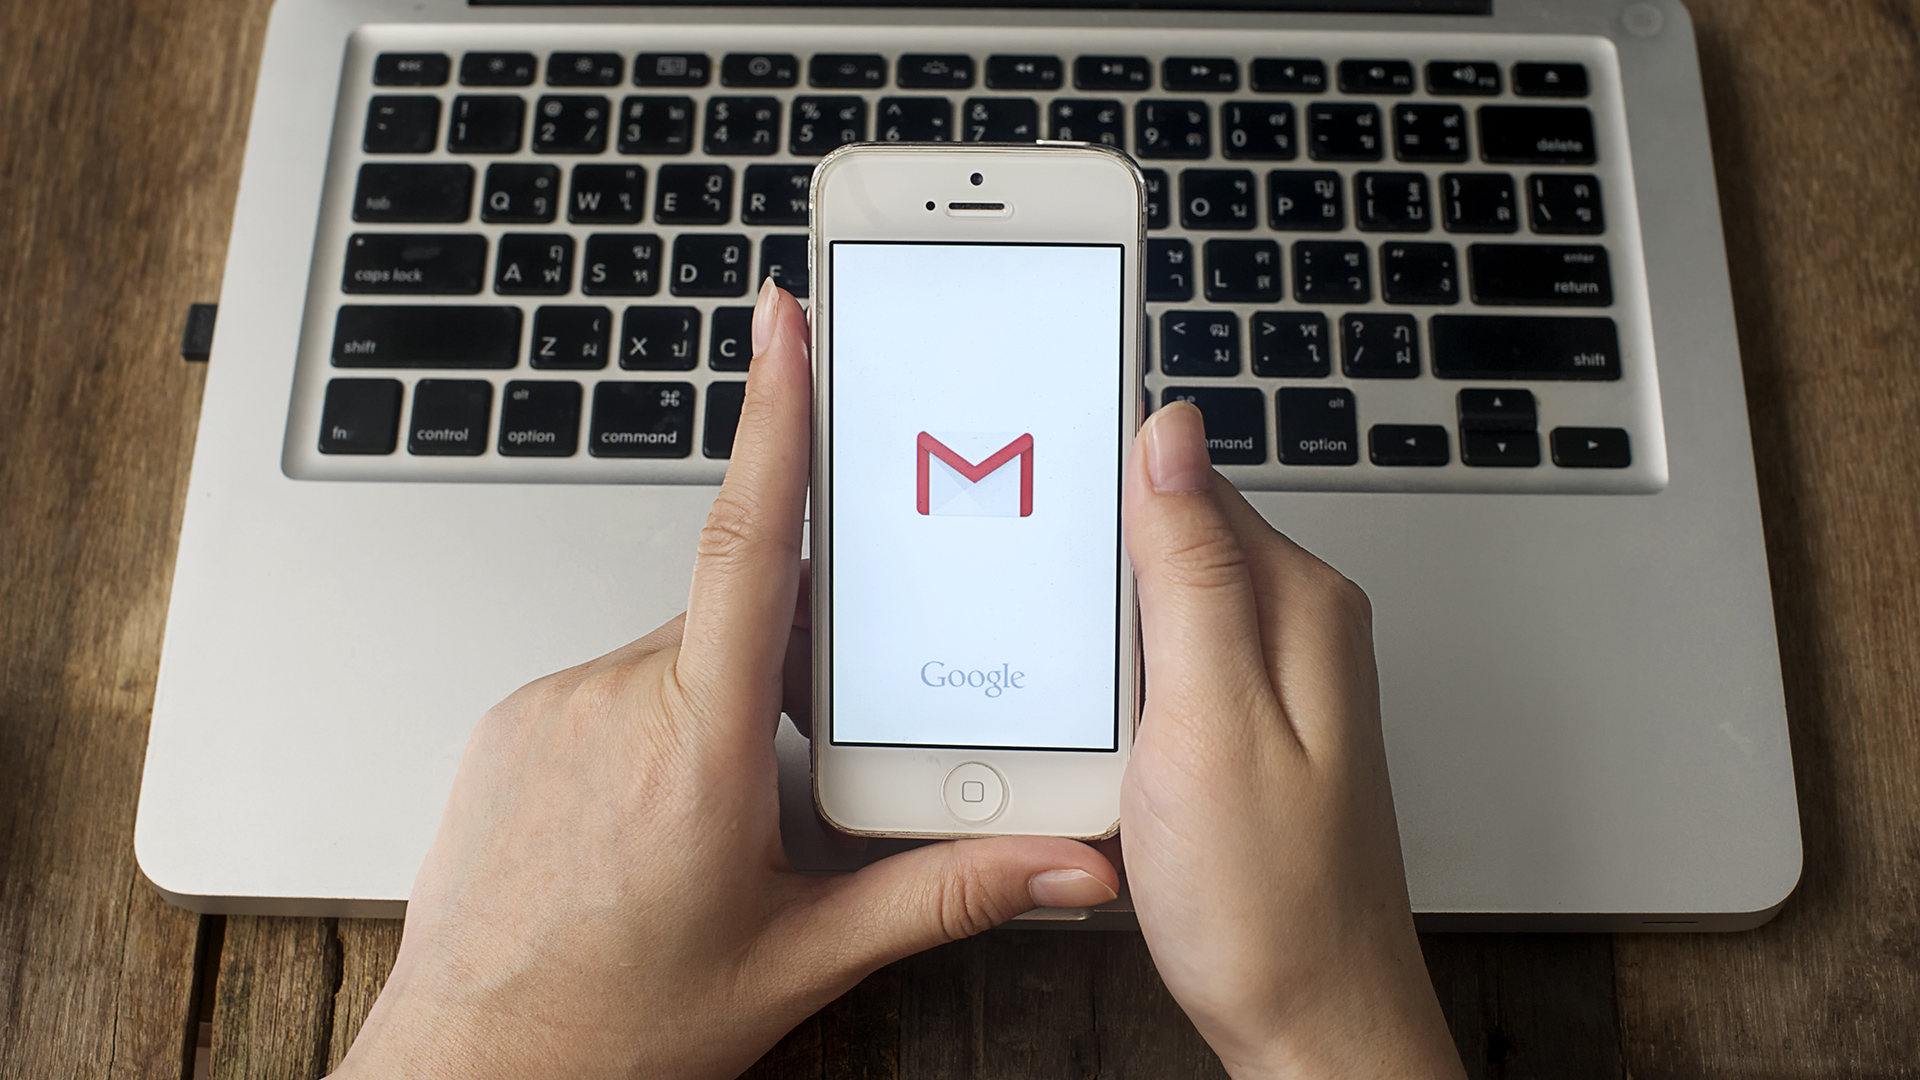 mrmohock / Shutterstock.com